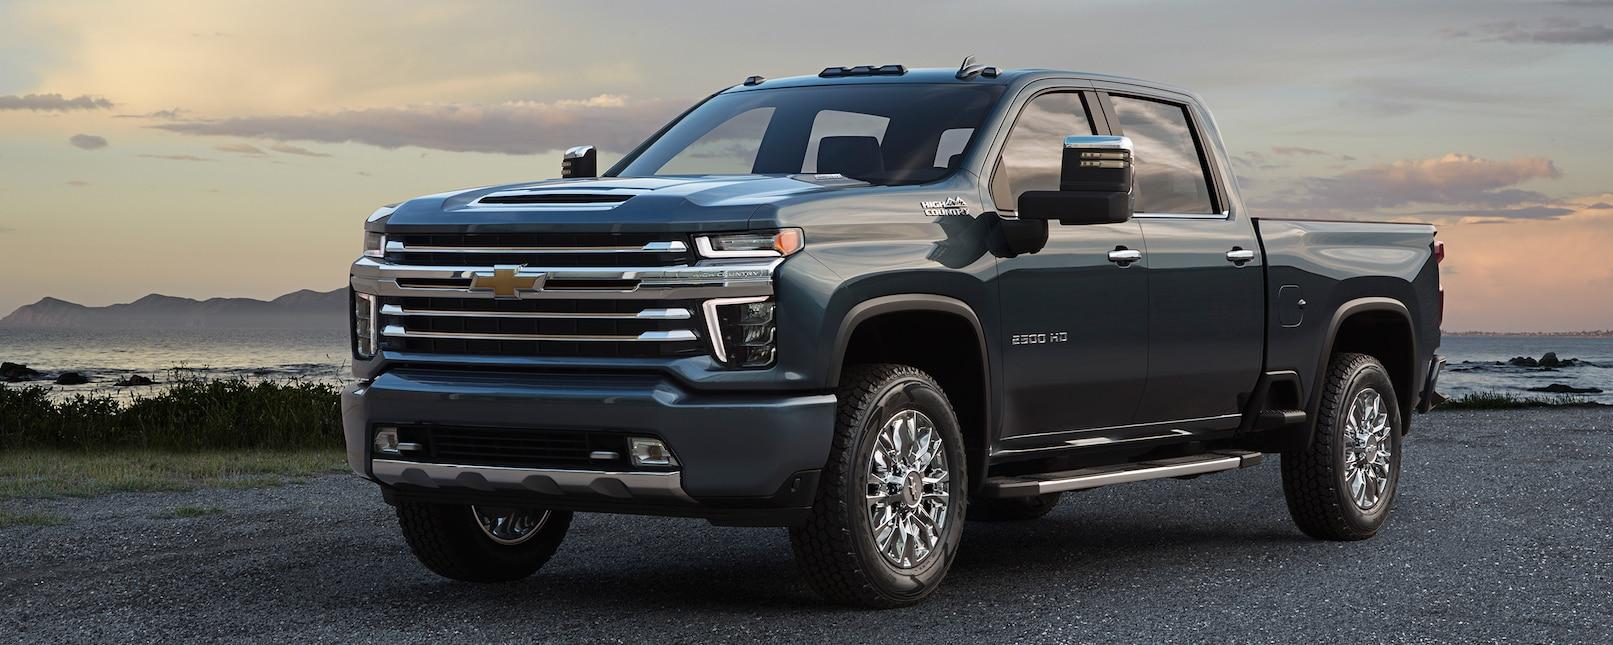 Upcoming Chevrolet Vehicles near Escondido, CA